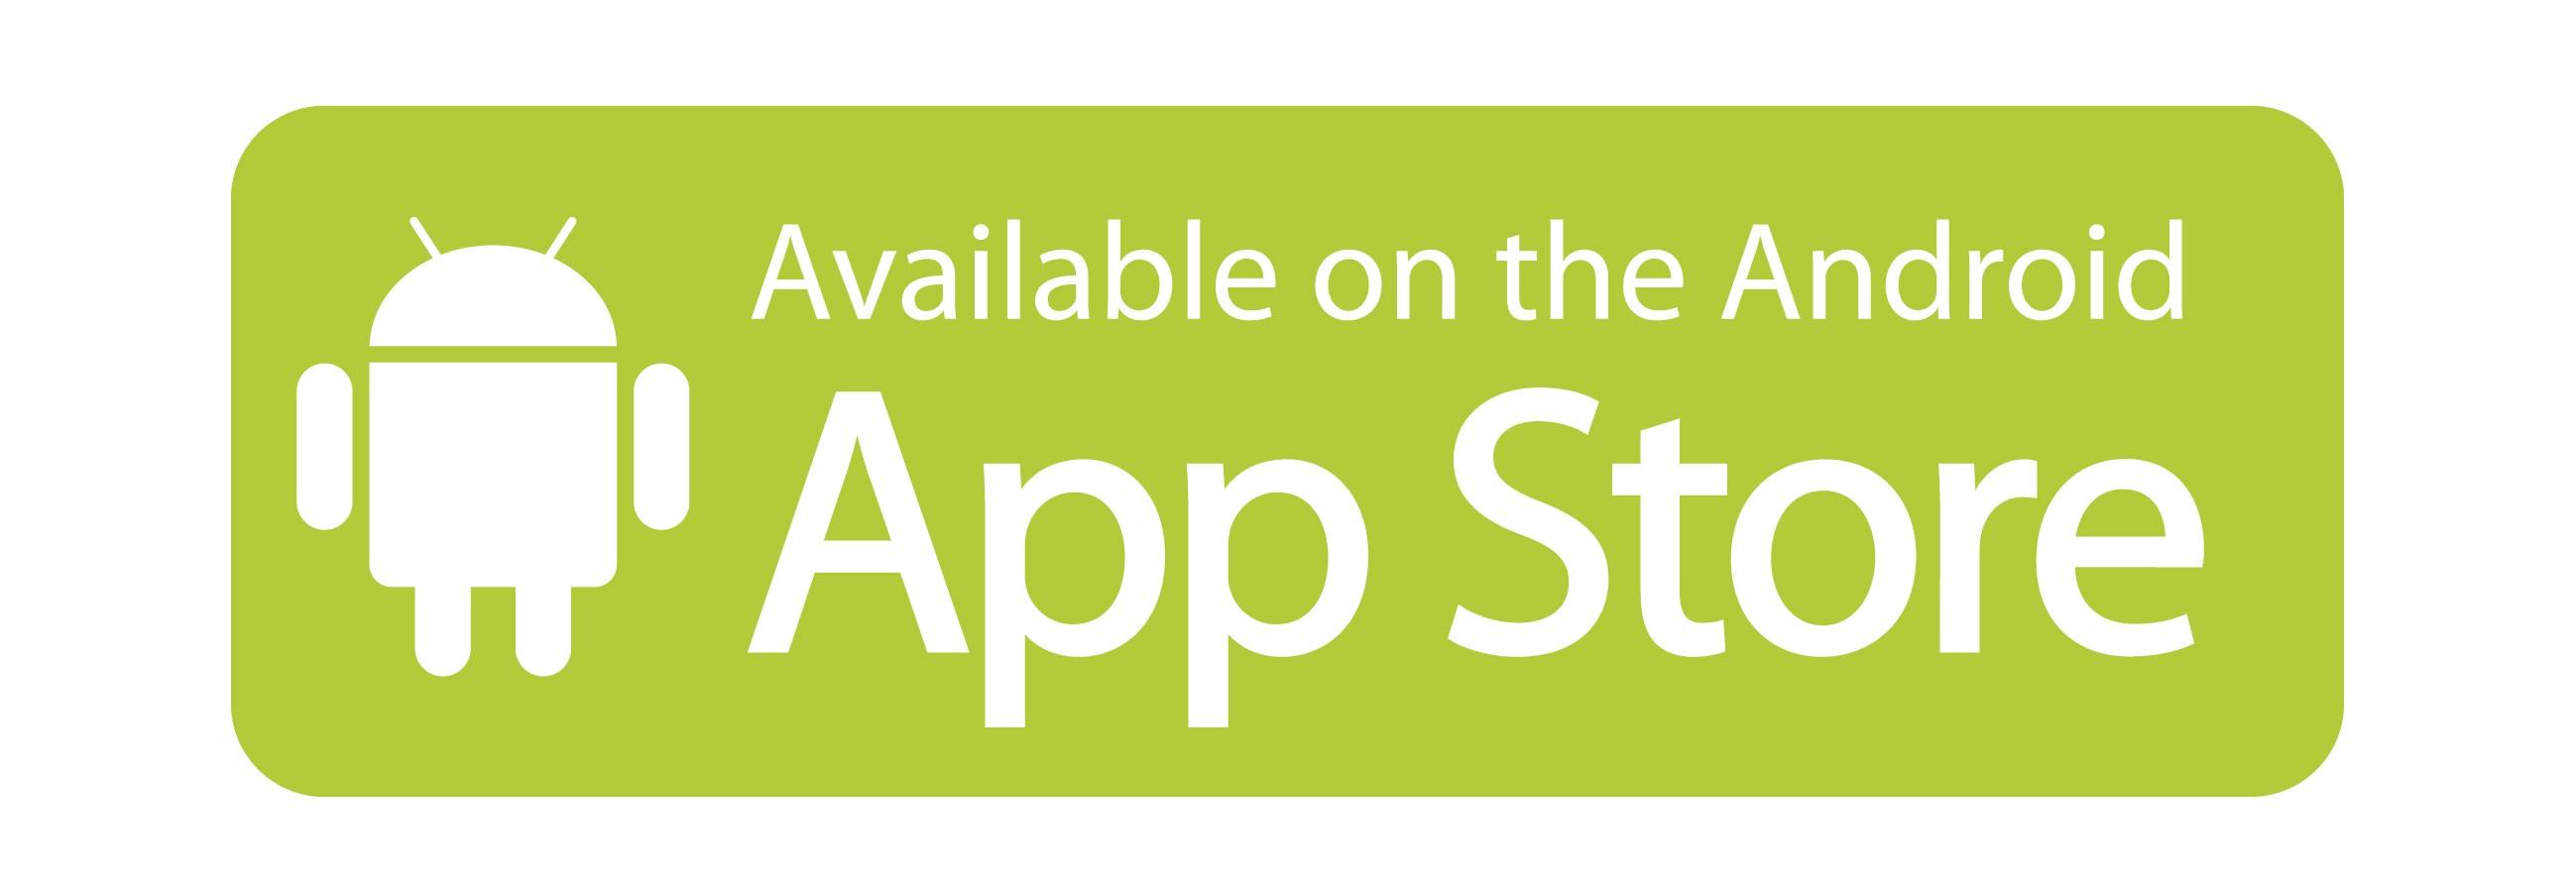 andriod app